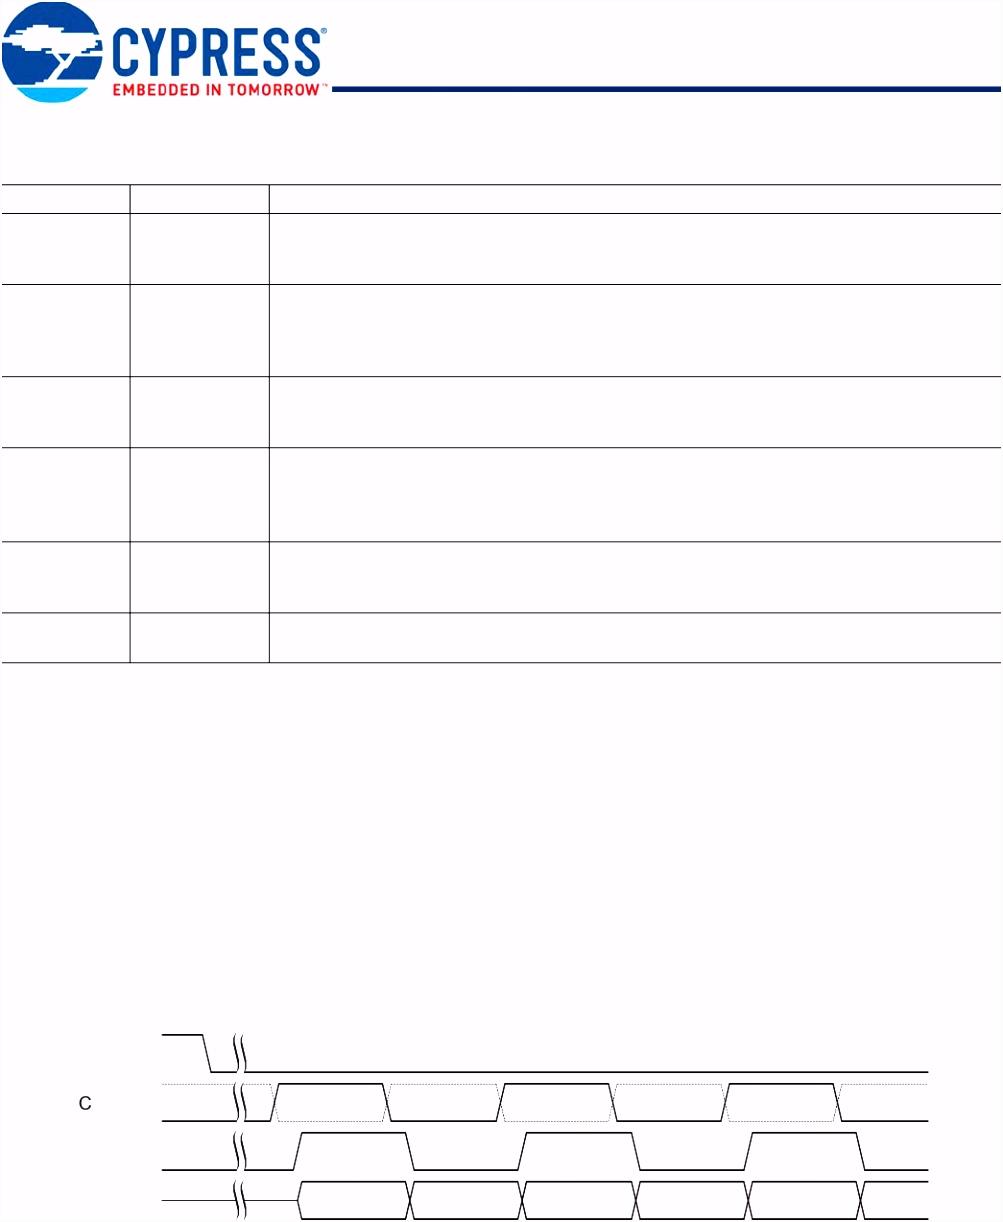 S27Kx0641 S70Kx1281 Datasheet Cypress